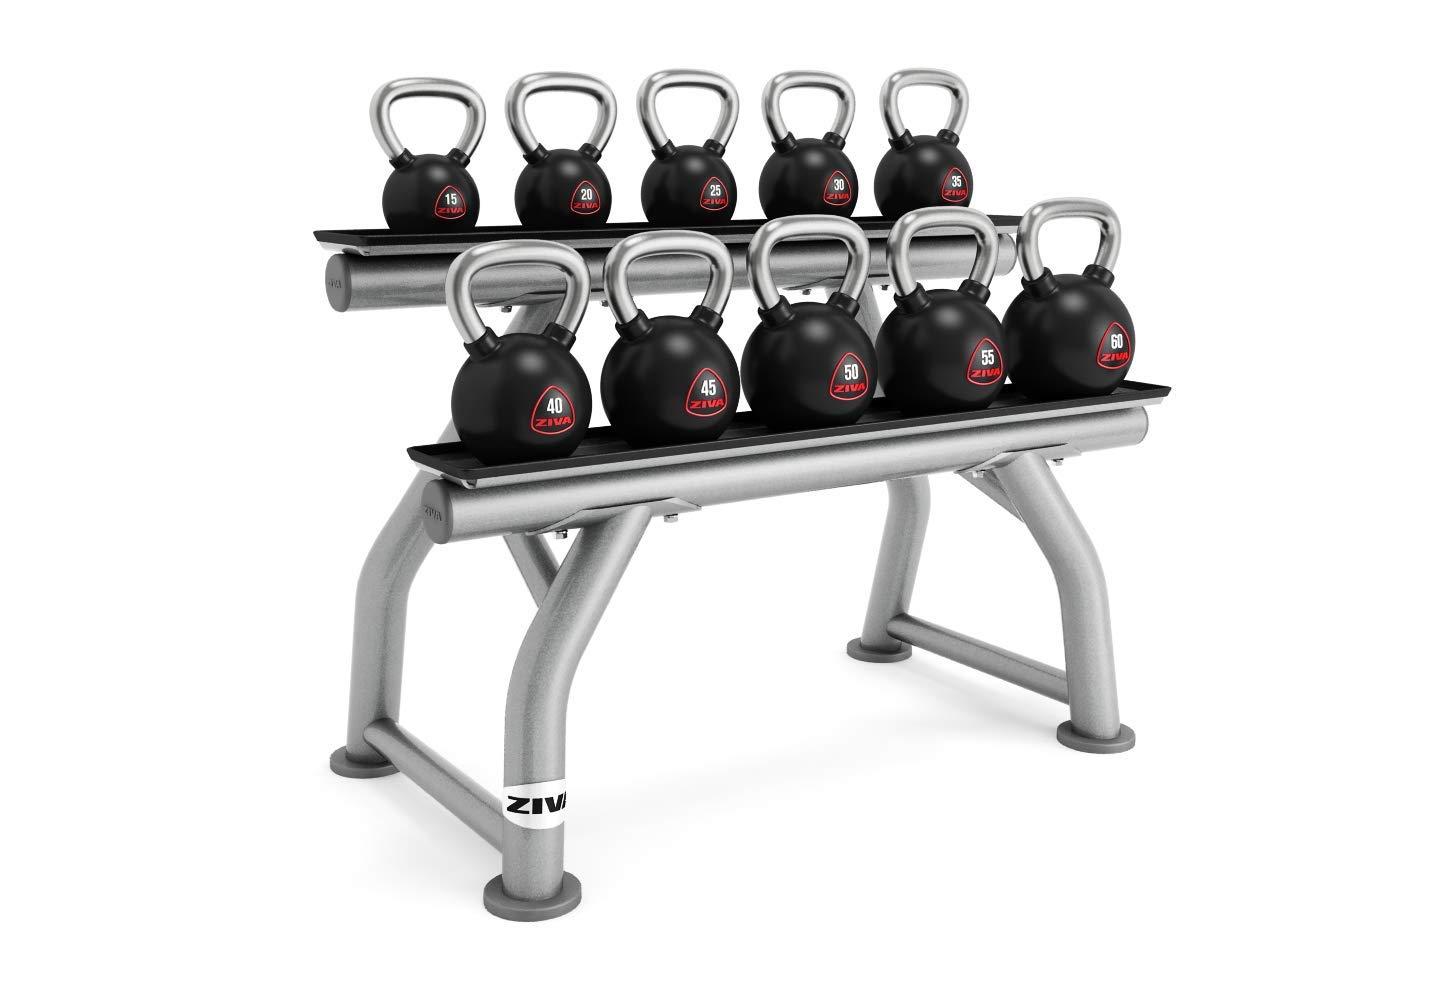 ZIVA SL Kettlebell Rack for Gym, Home Storage – 3'' Round 11-Gauge Steel Frame, Rubber Saddles – Holds 10 Kettlebells (Sold Separately), Platinum, One Size